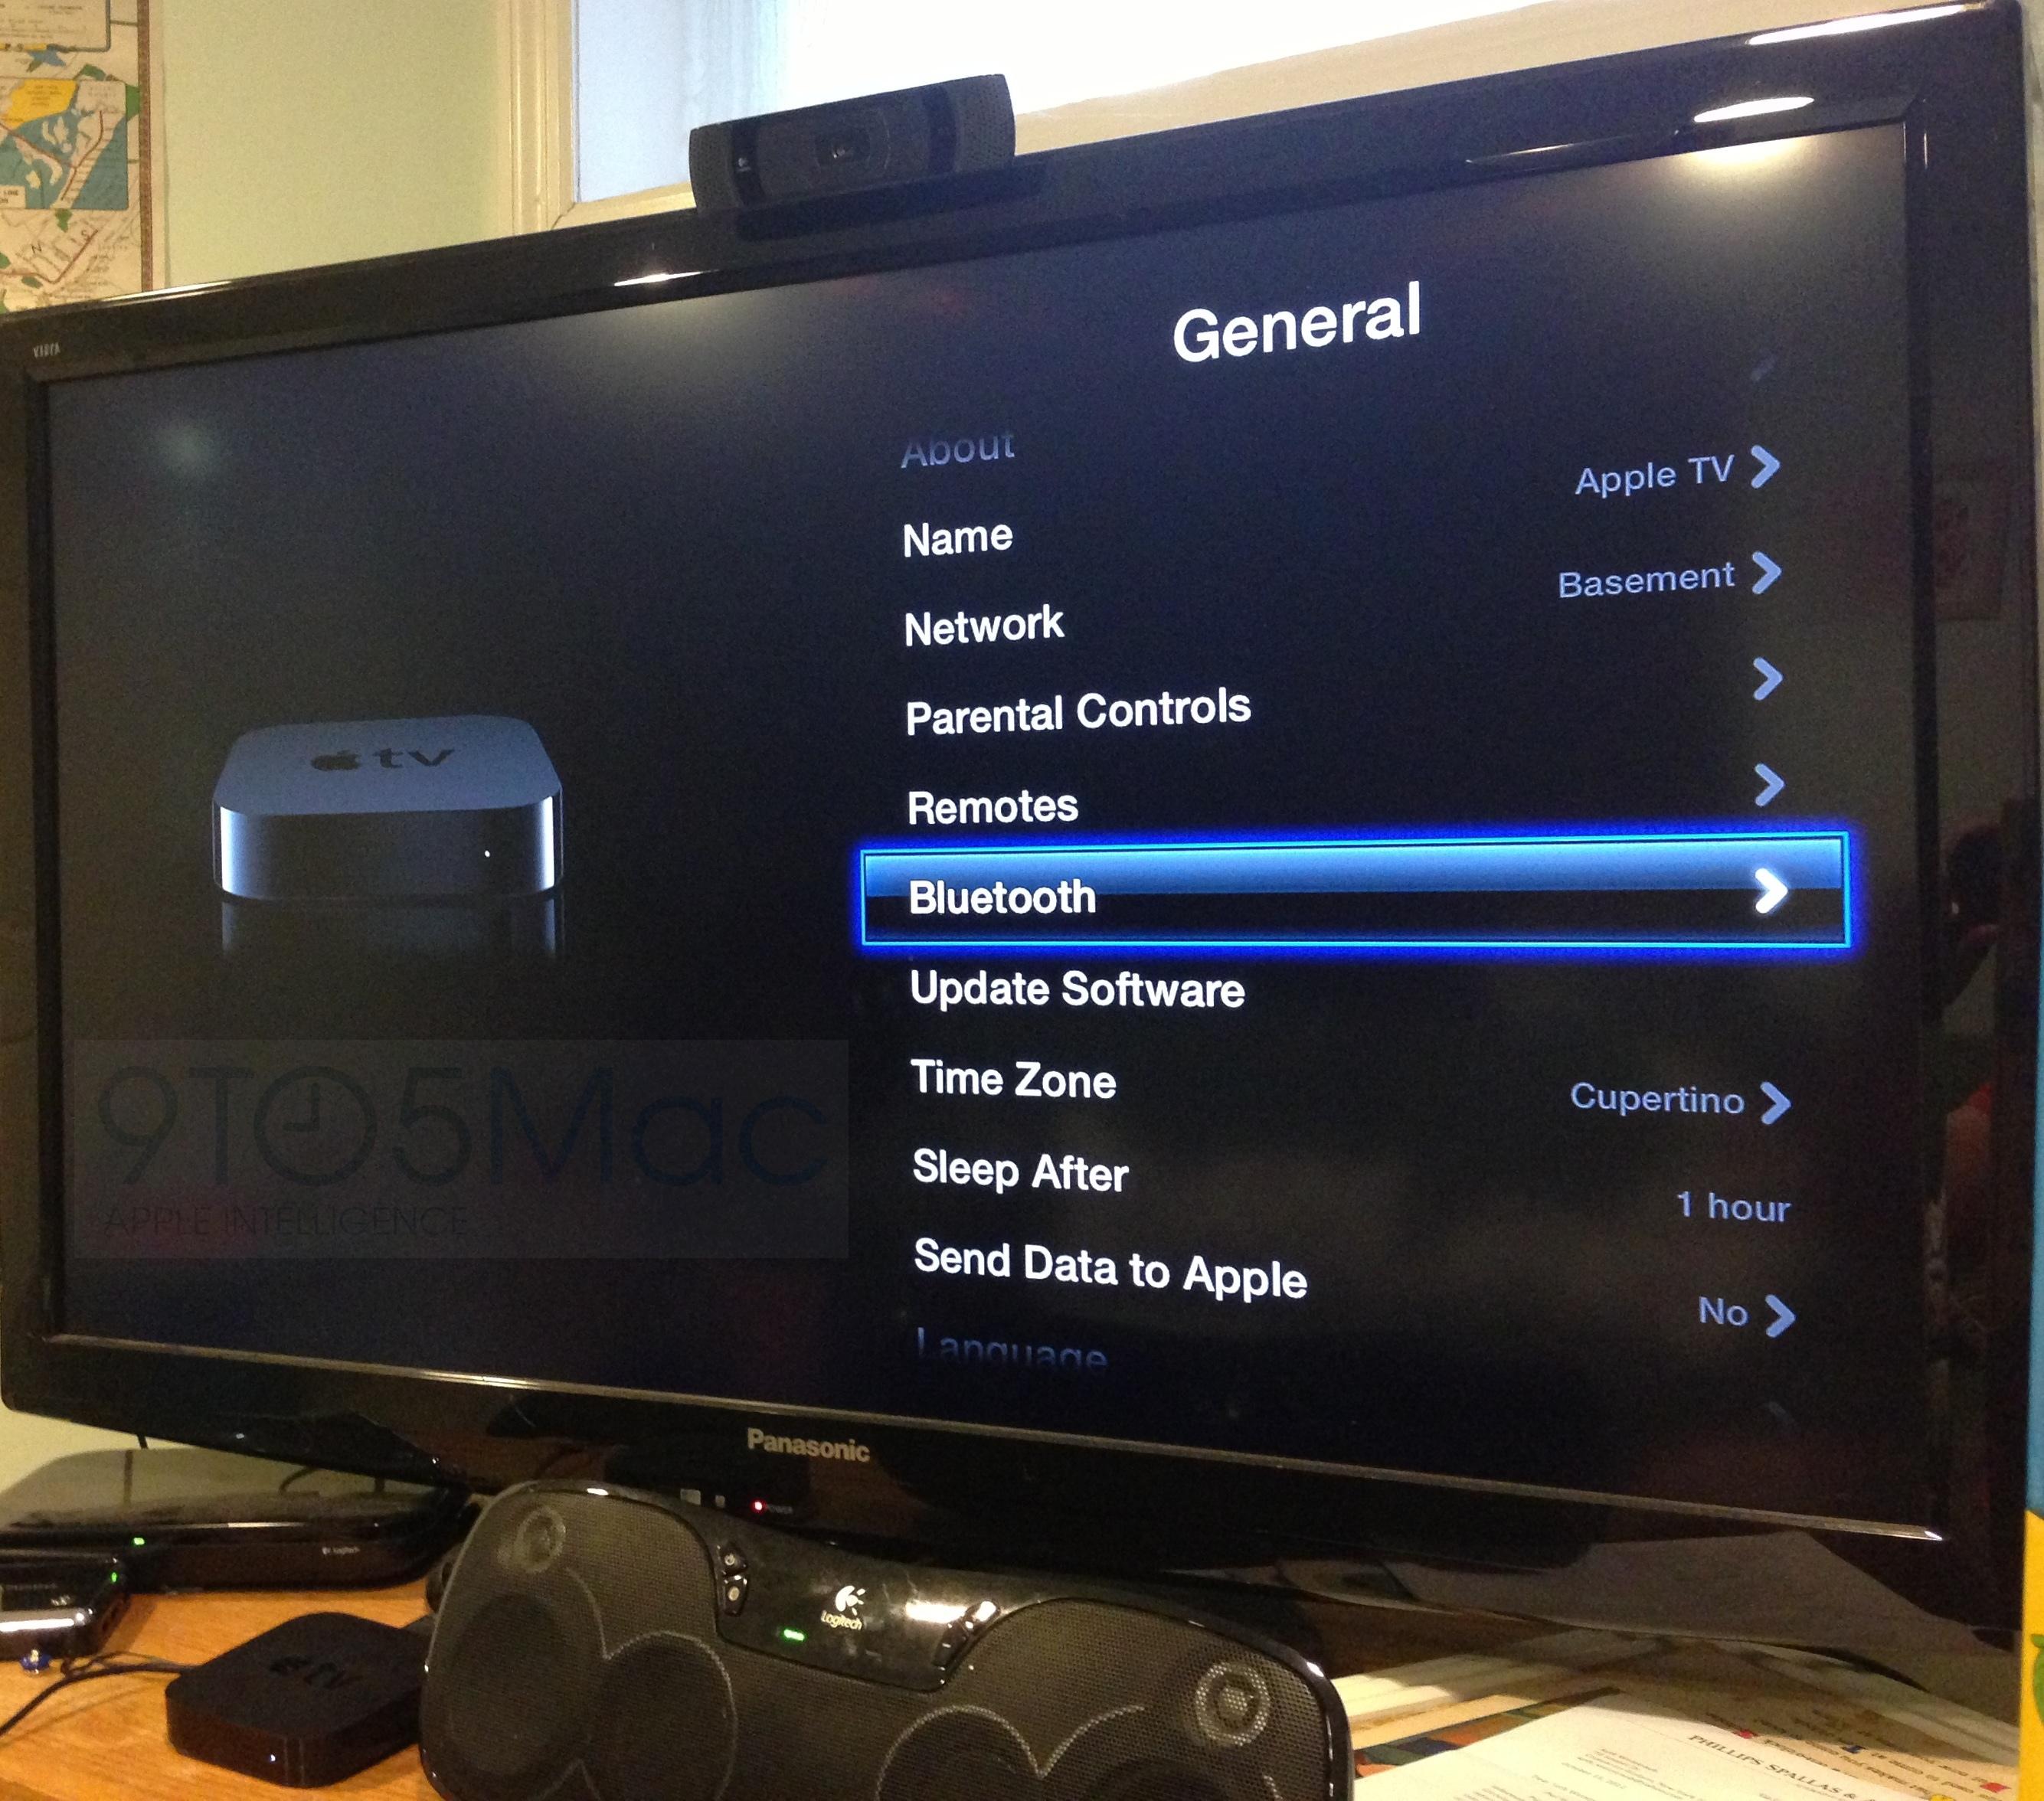 Teclado Bluetooth na Apple TV